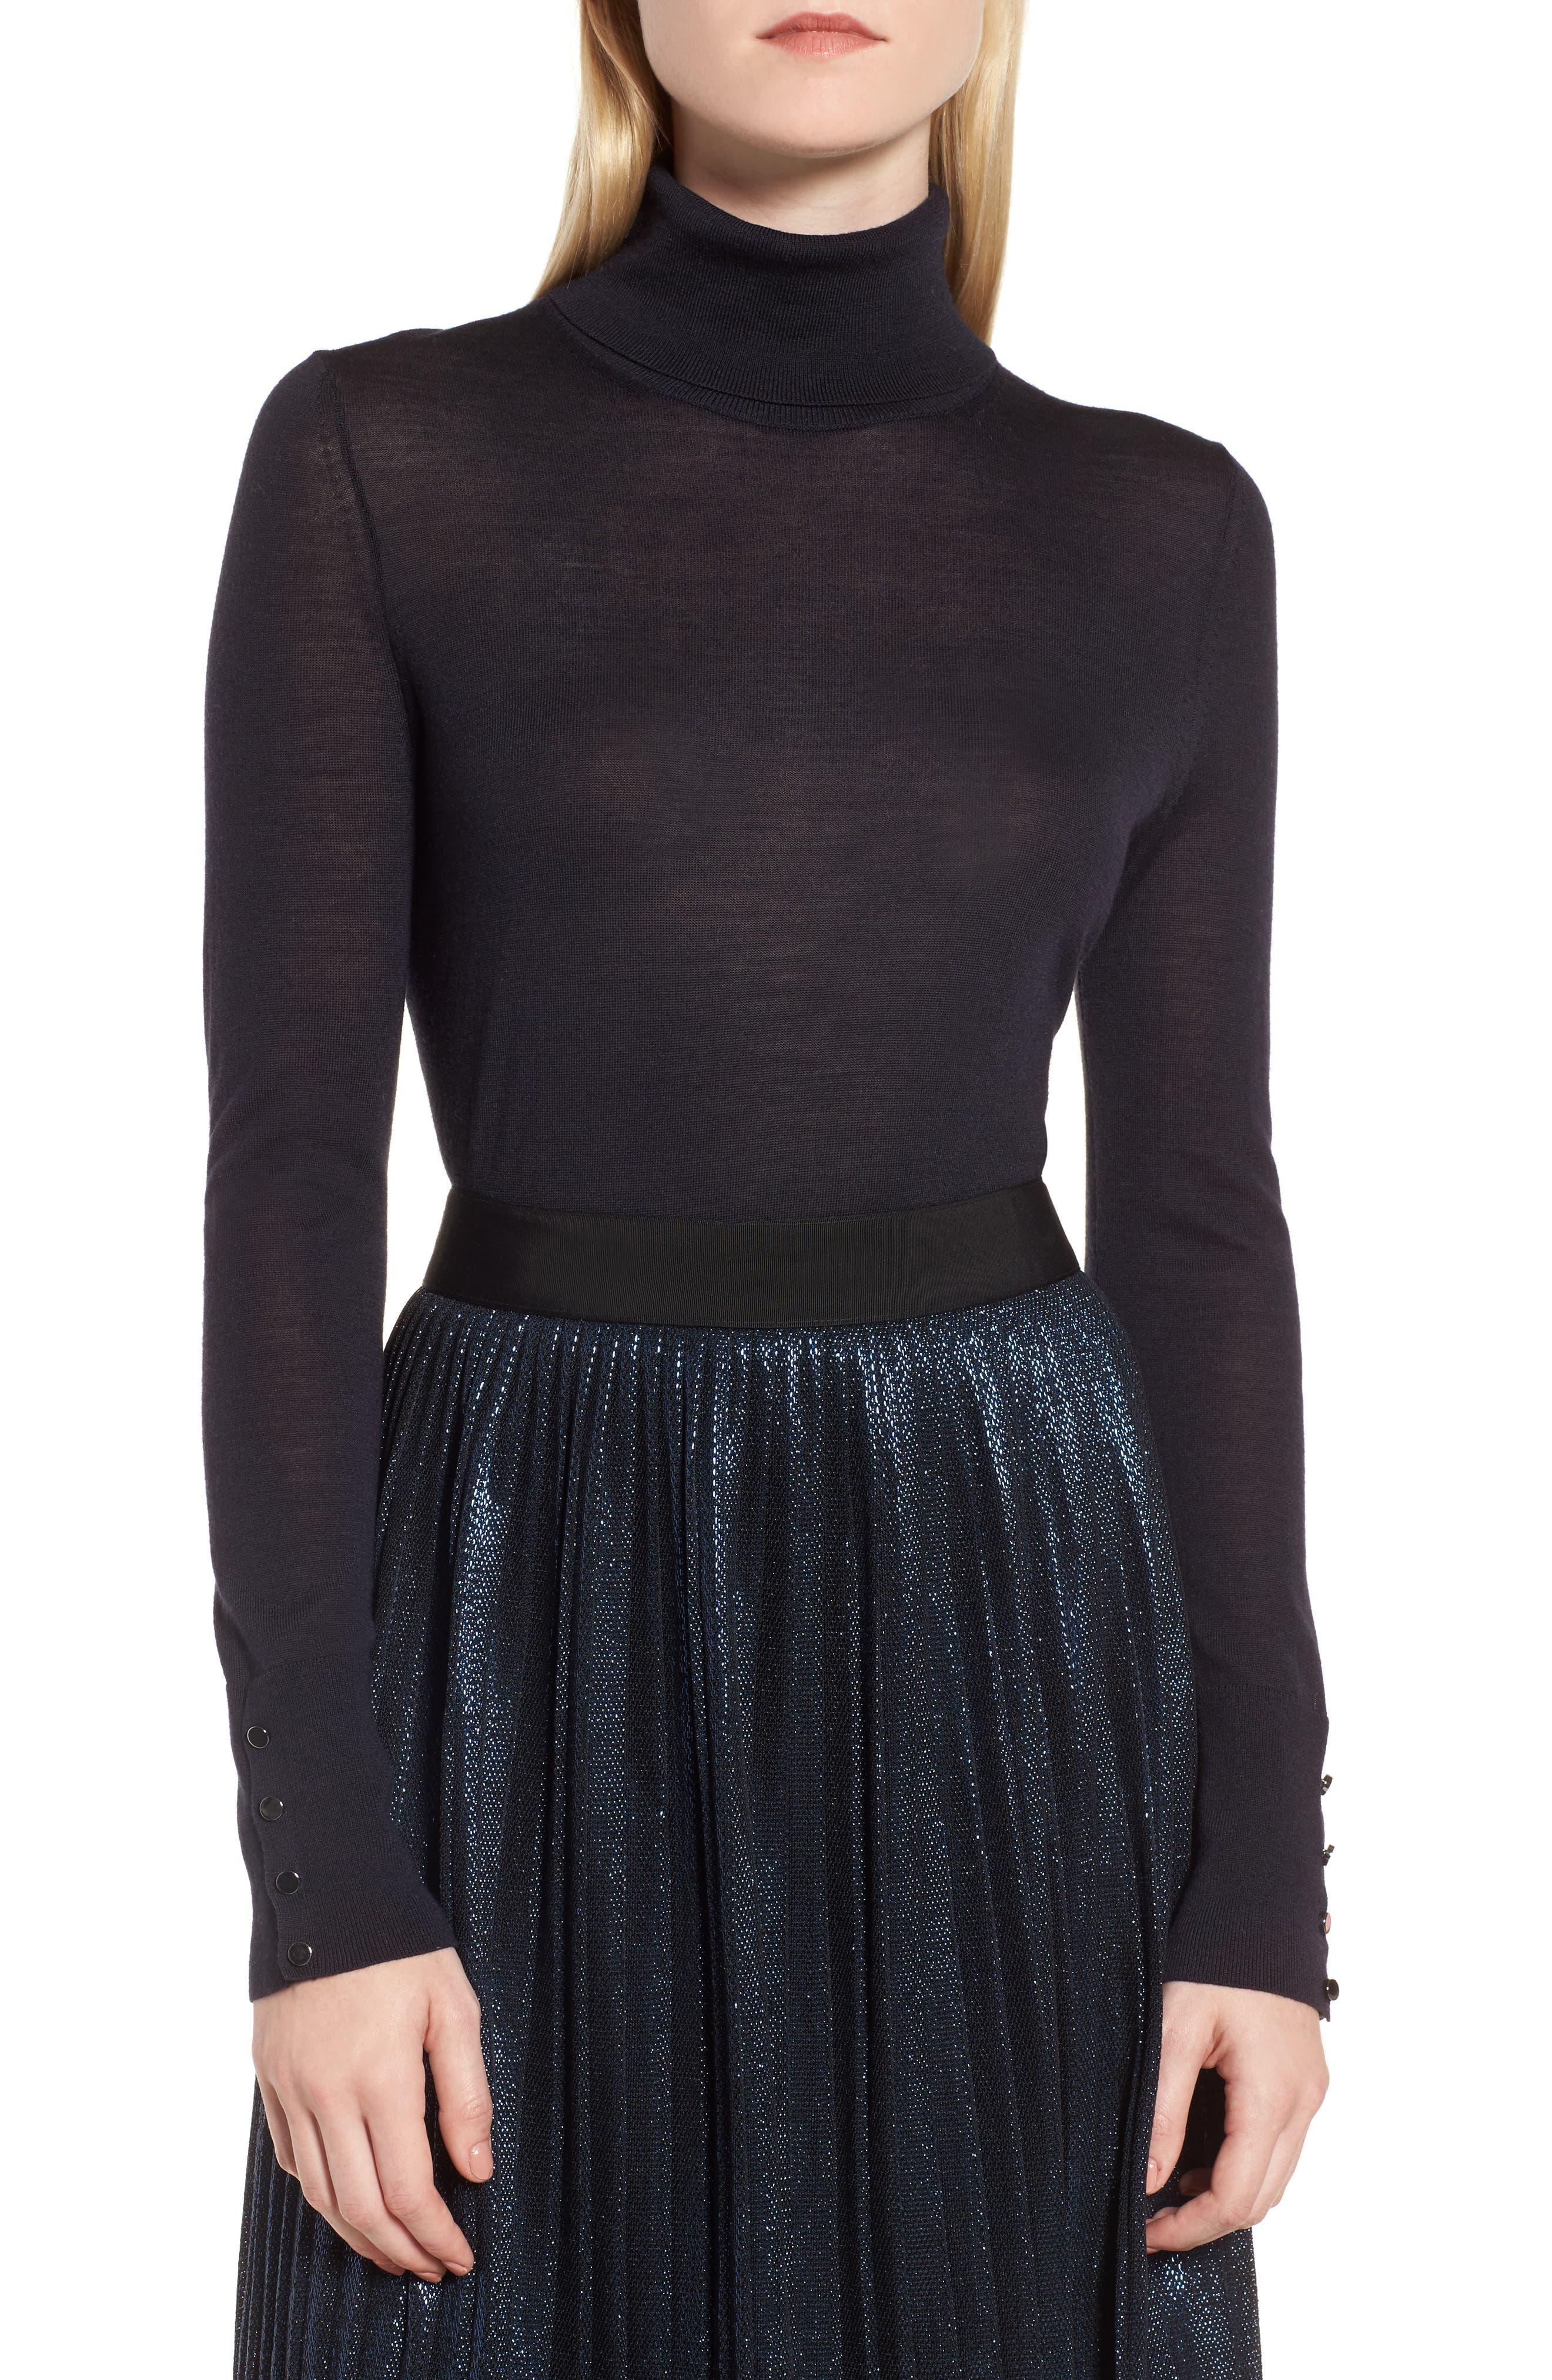 Main Image - BOSS Farrella Wool Turtleneck Sweater